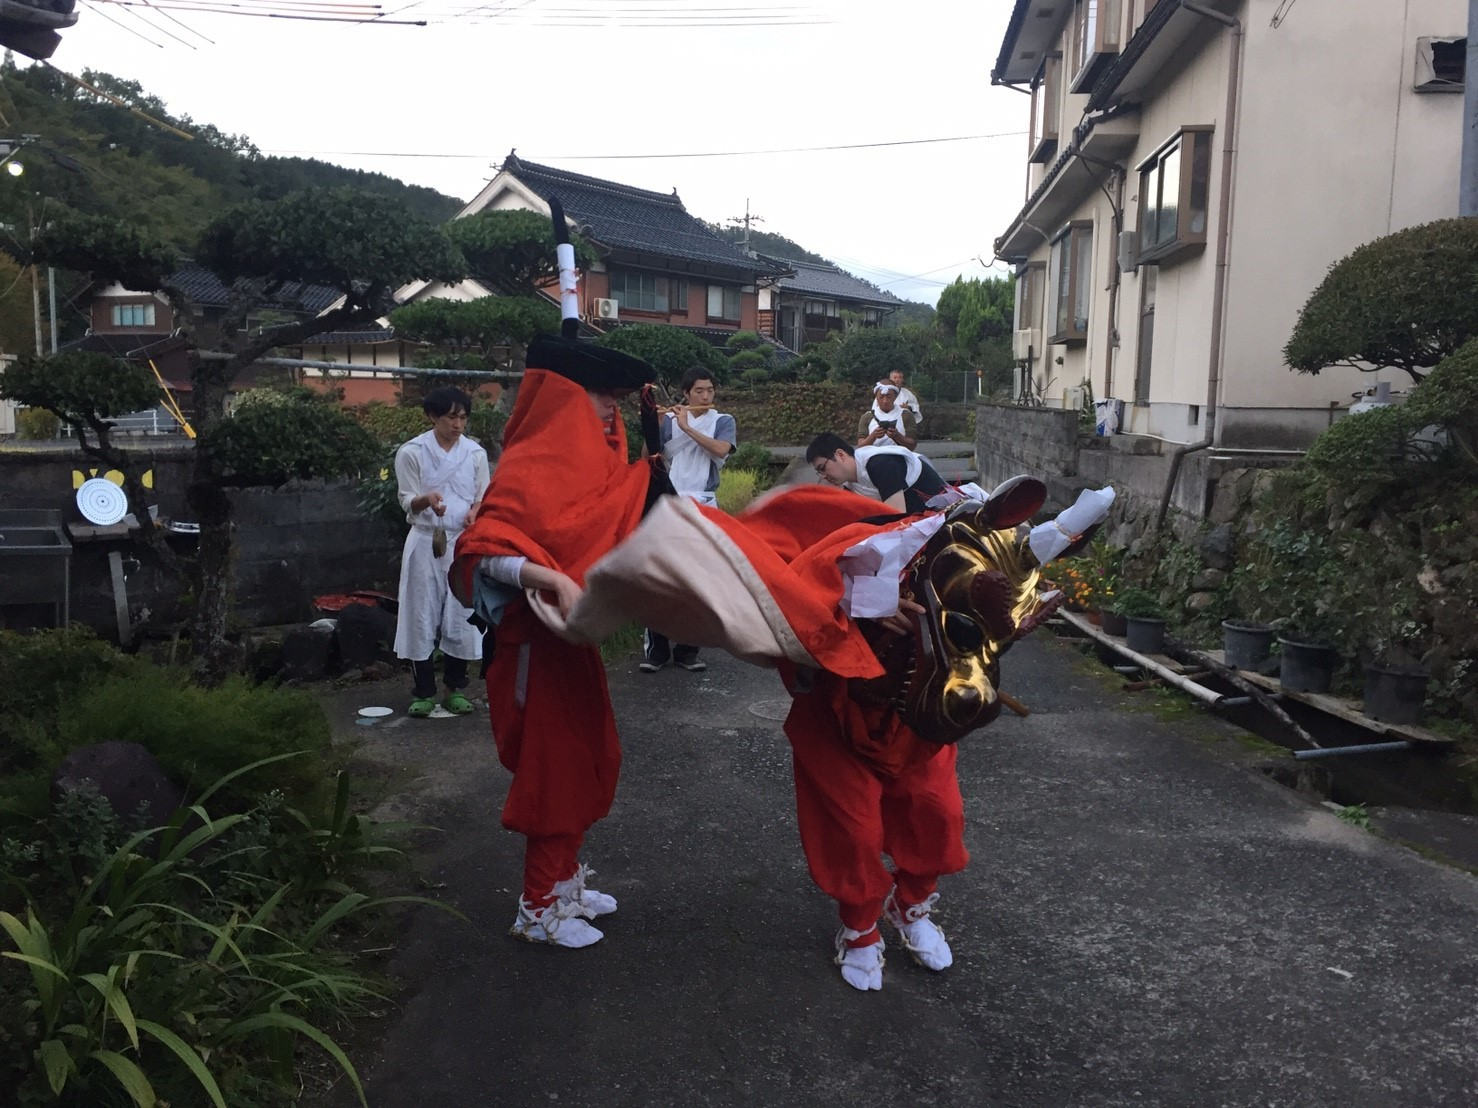 中井地区祭り2018_e0115904_02434979.jpg